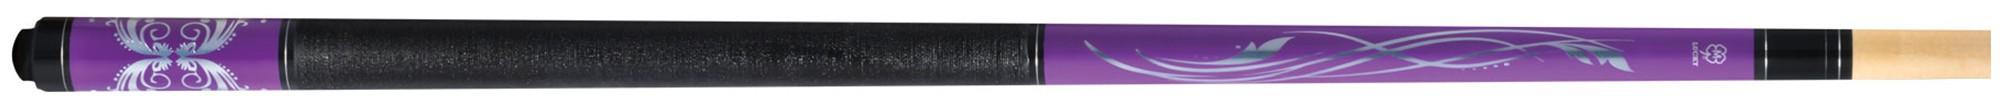 Mc Dermott Lucky L59 purple paint